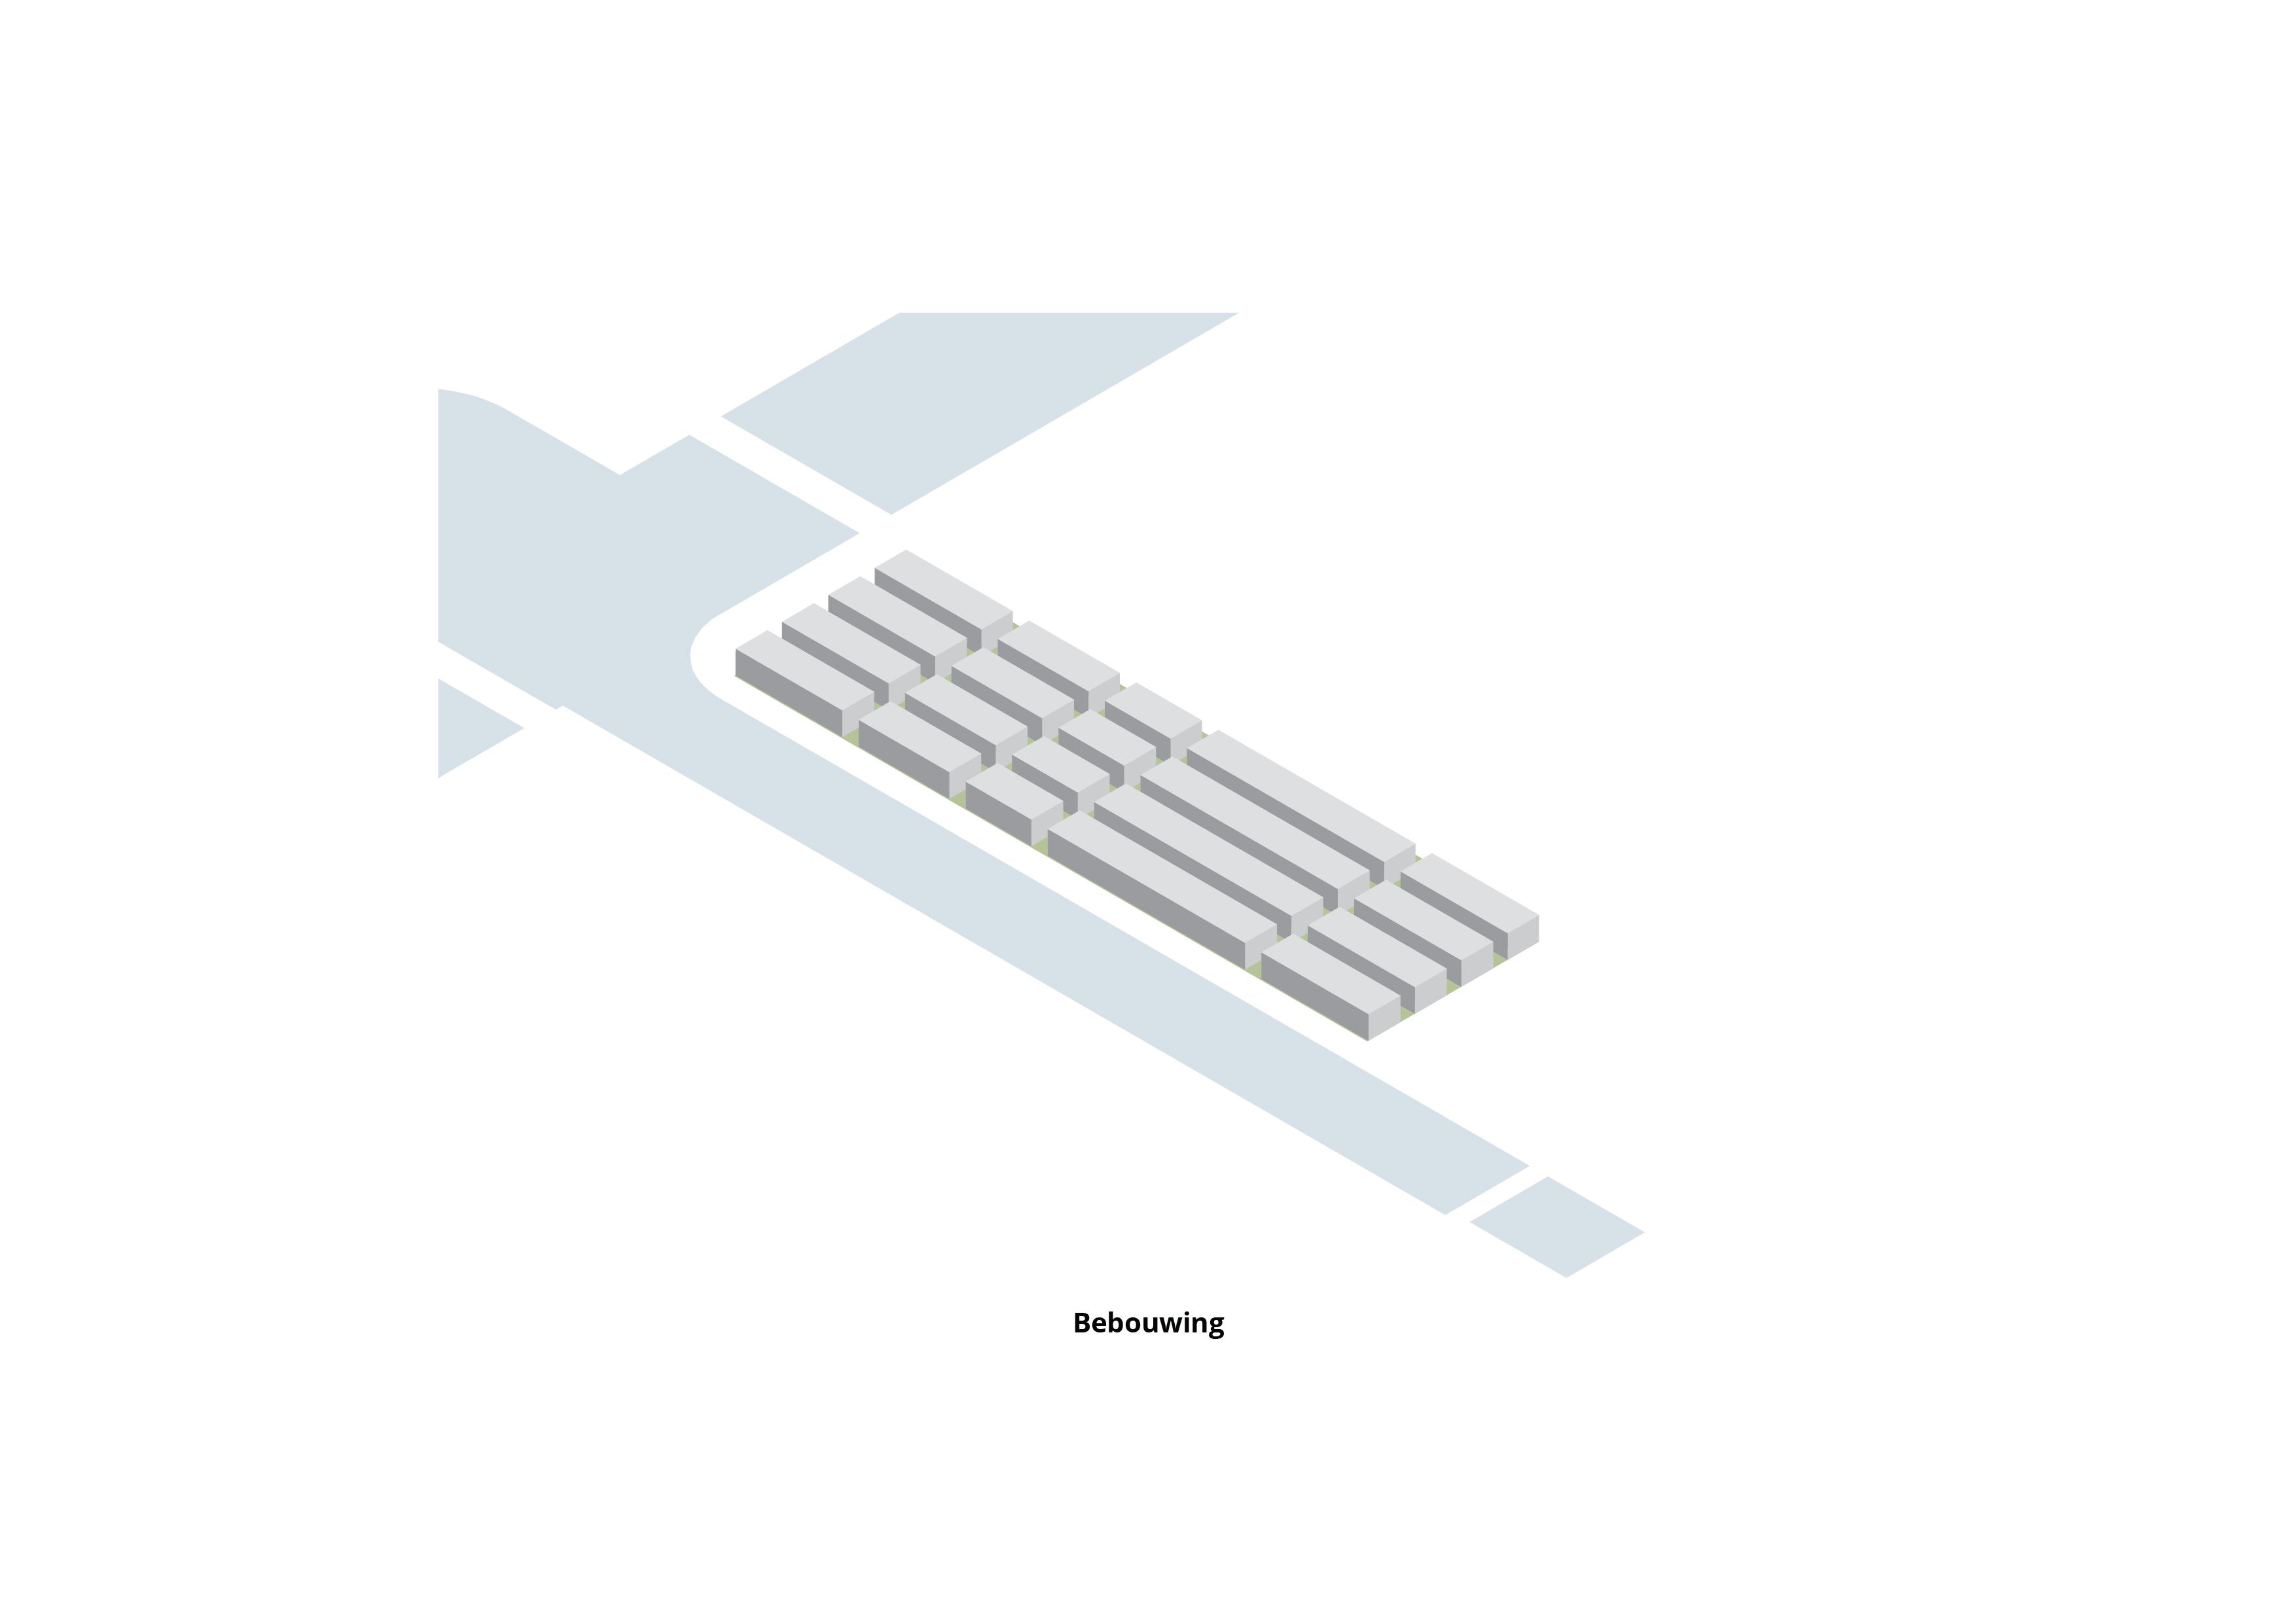 Oosterhamrikzone – Bebouwing